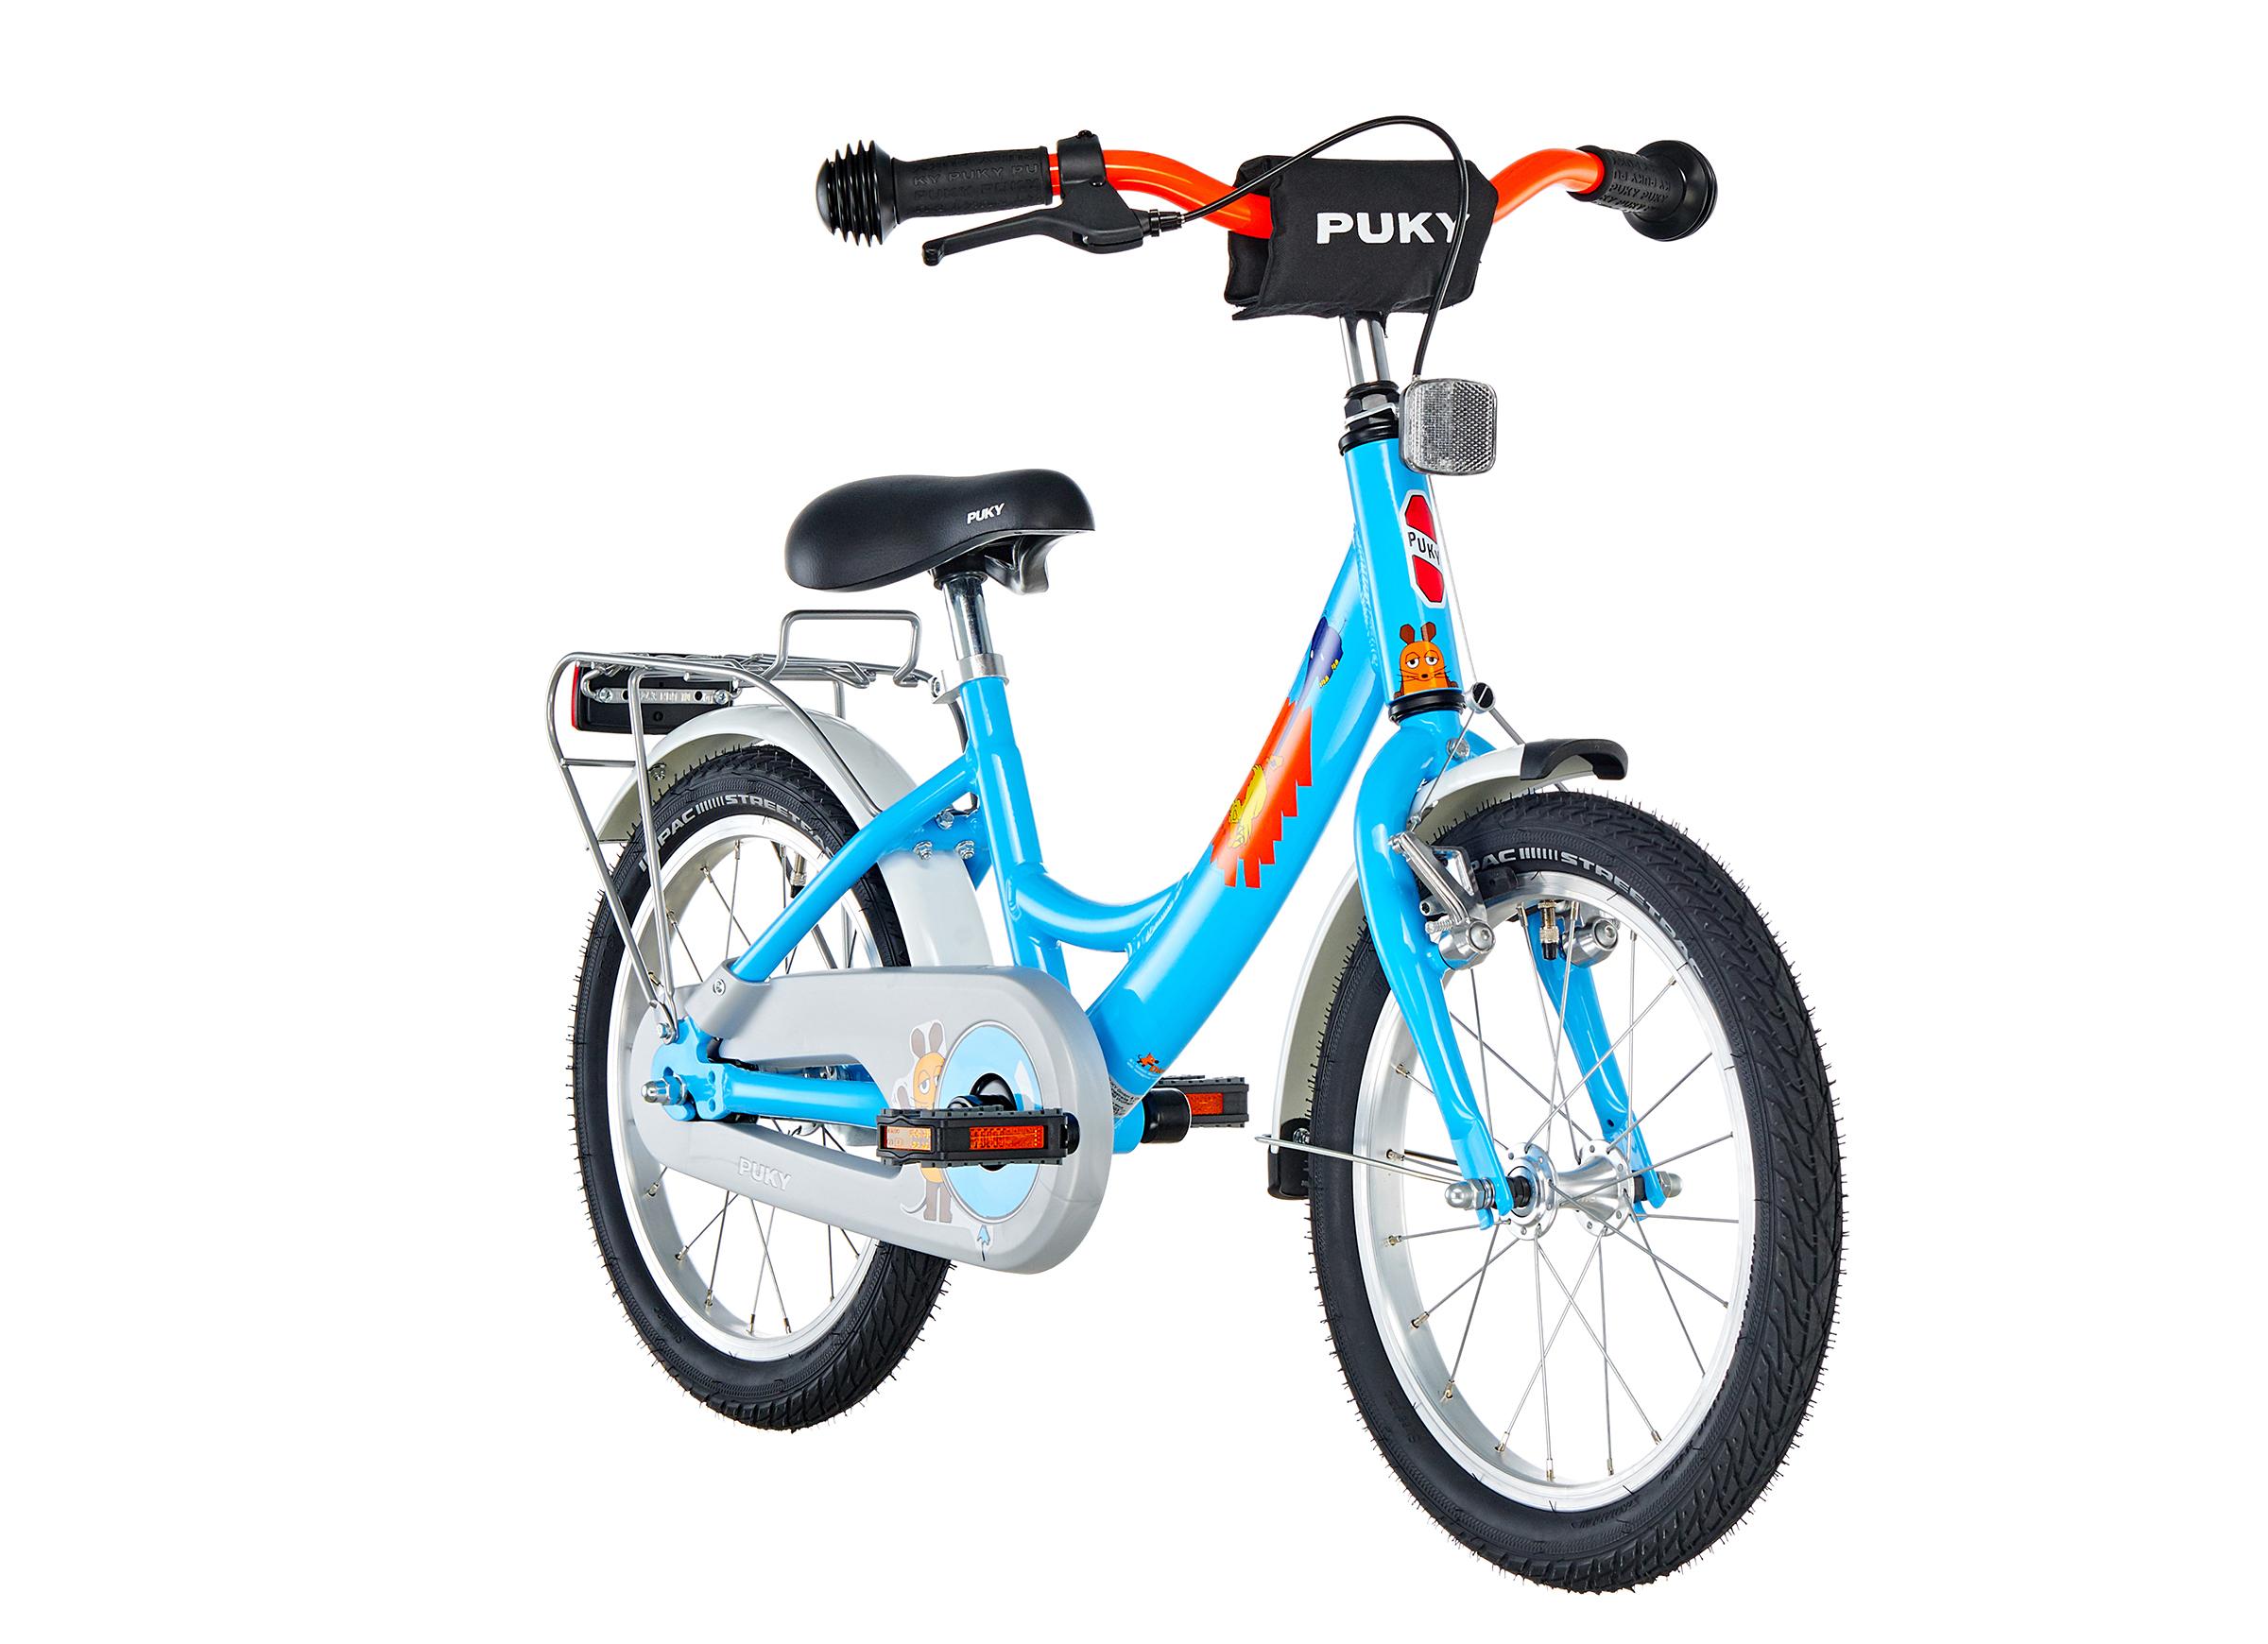 "Puky ZL 16-1 Alu Bicycle 16"" Kids maus"